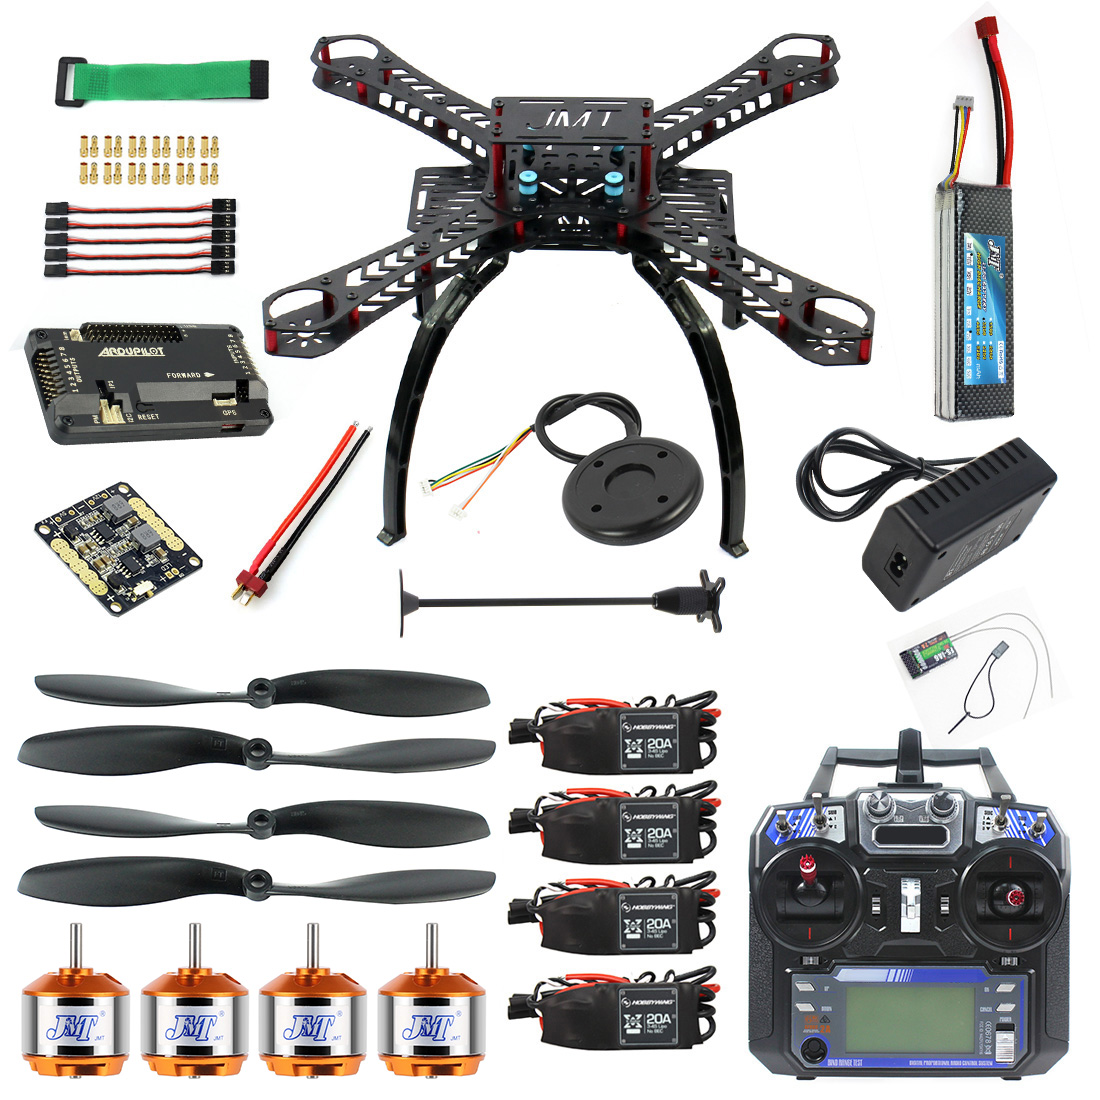 Radiolink 2.4 G Cadre F08191-H APM2.8 GPS Full AT10 S500 TX Kit RX À faire soi-même Drone